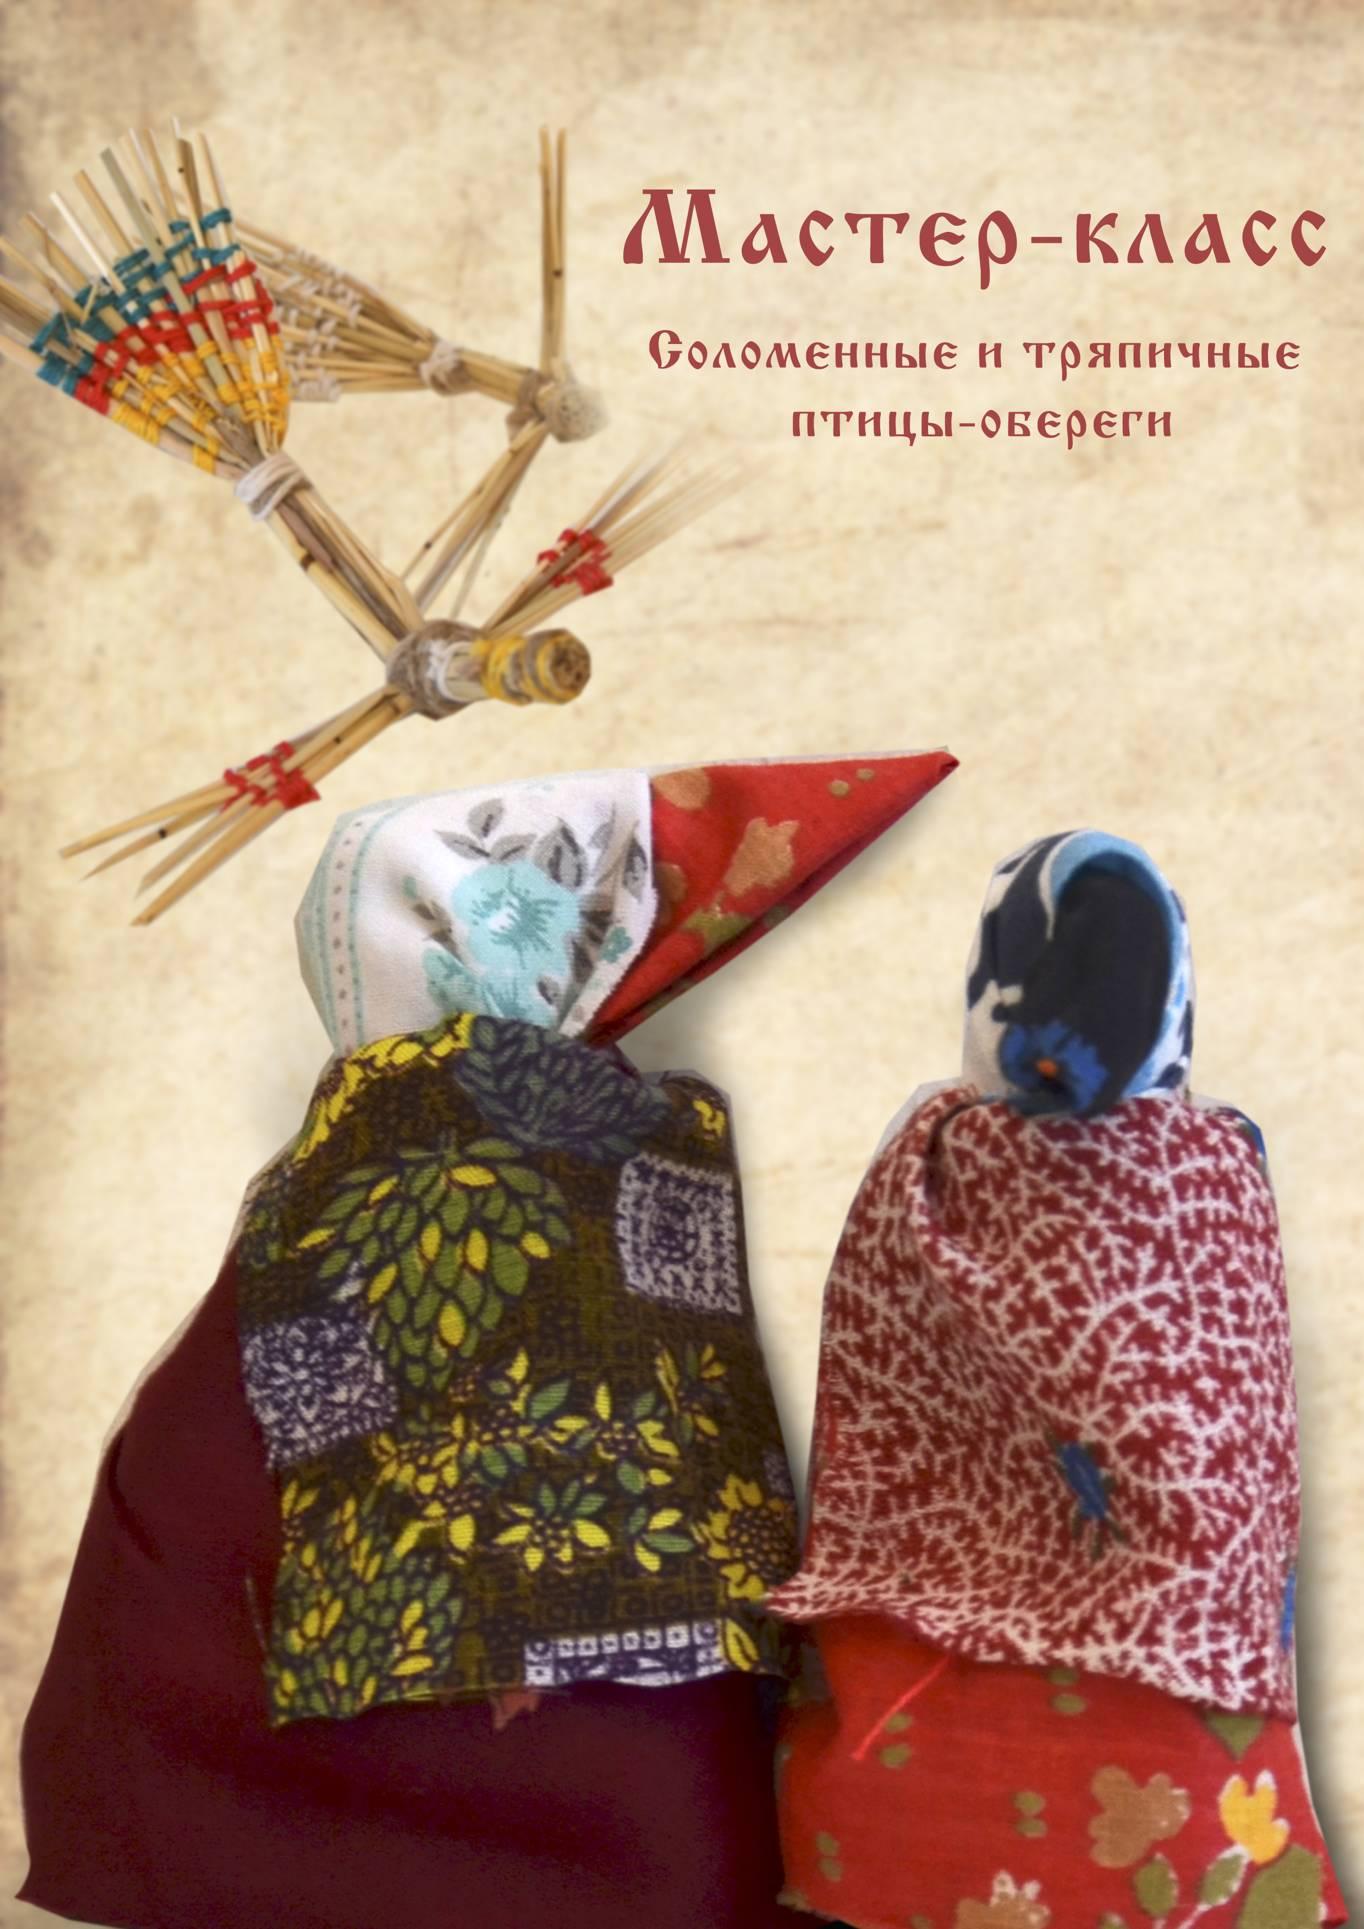 Путешествие в мир птиц - 11872-5